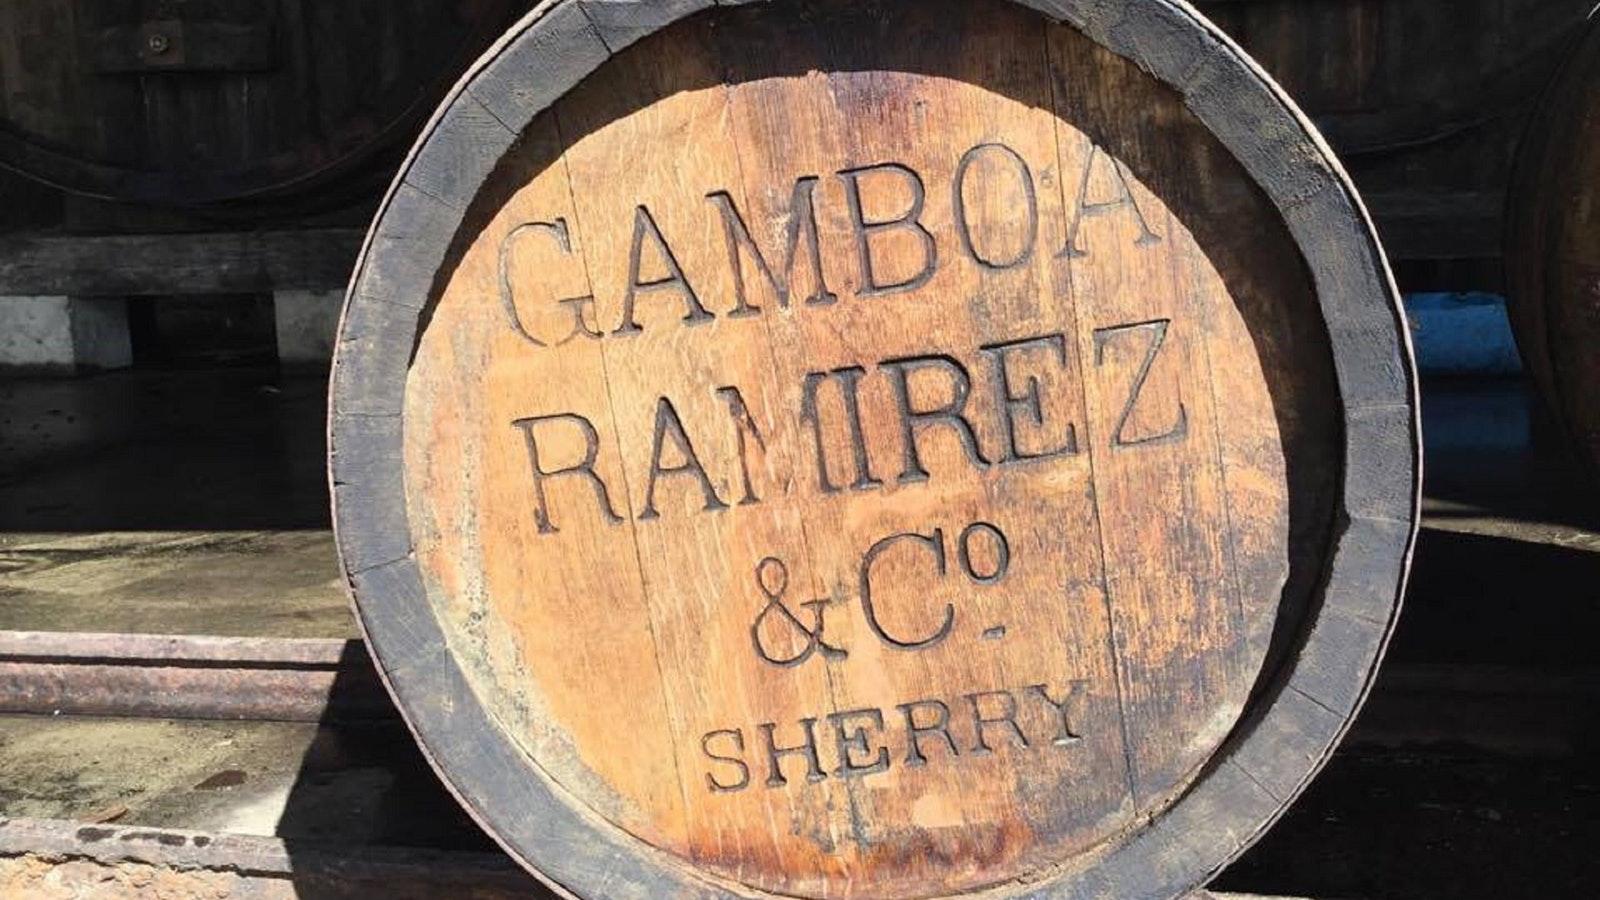 Gamboa Ramirez & Co Sherry Barrel